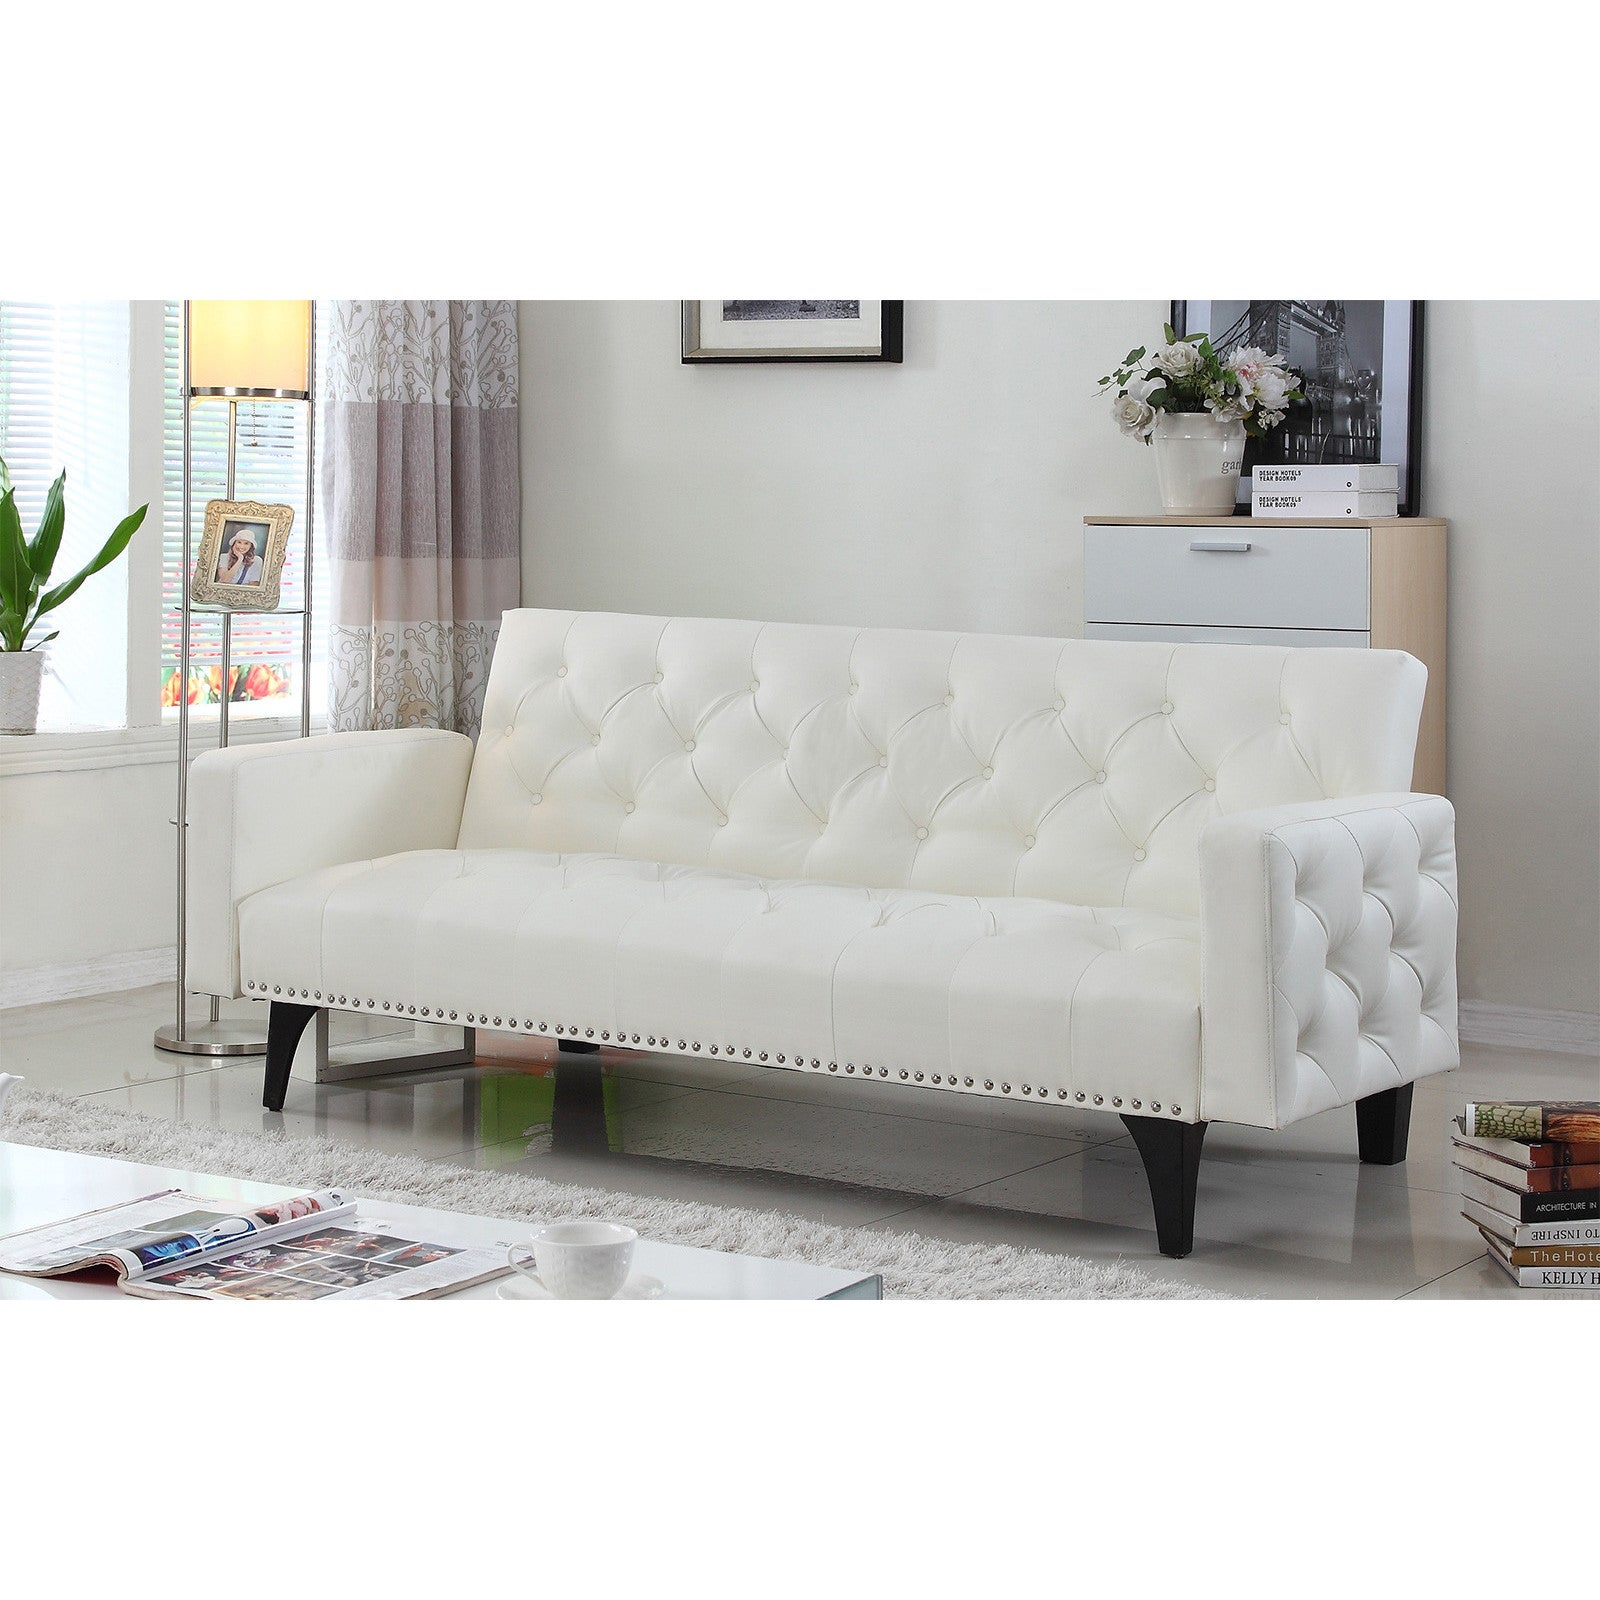 Fantastic Modern Tufted Bonded Leather Sleeper Futon Sofa With Nailhead Trim Forskolin Free Trial Chair Design Images Forskolin Free Trialorg